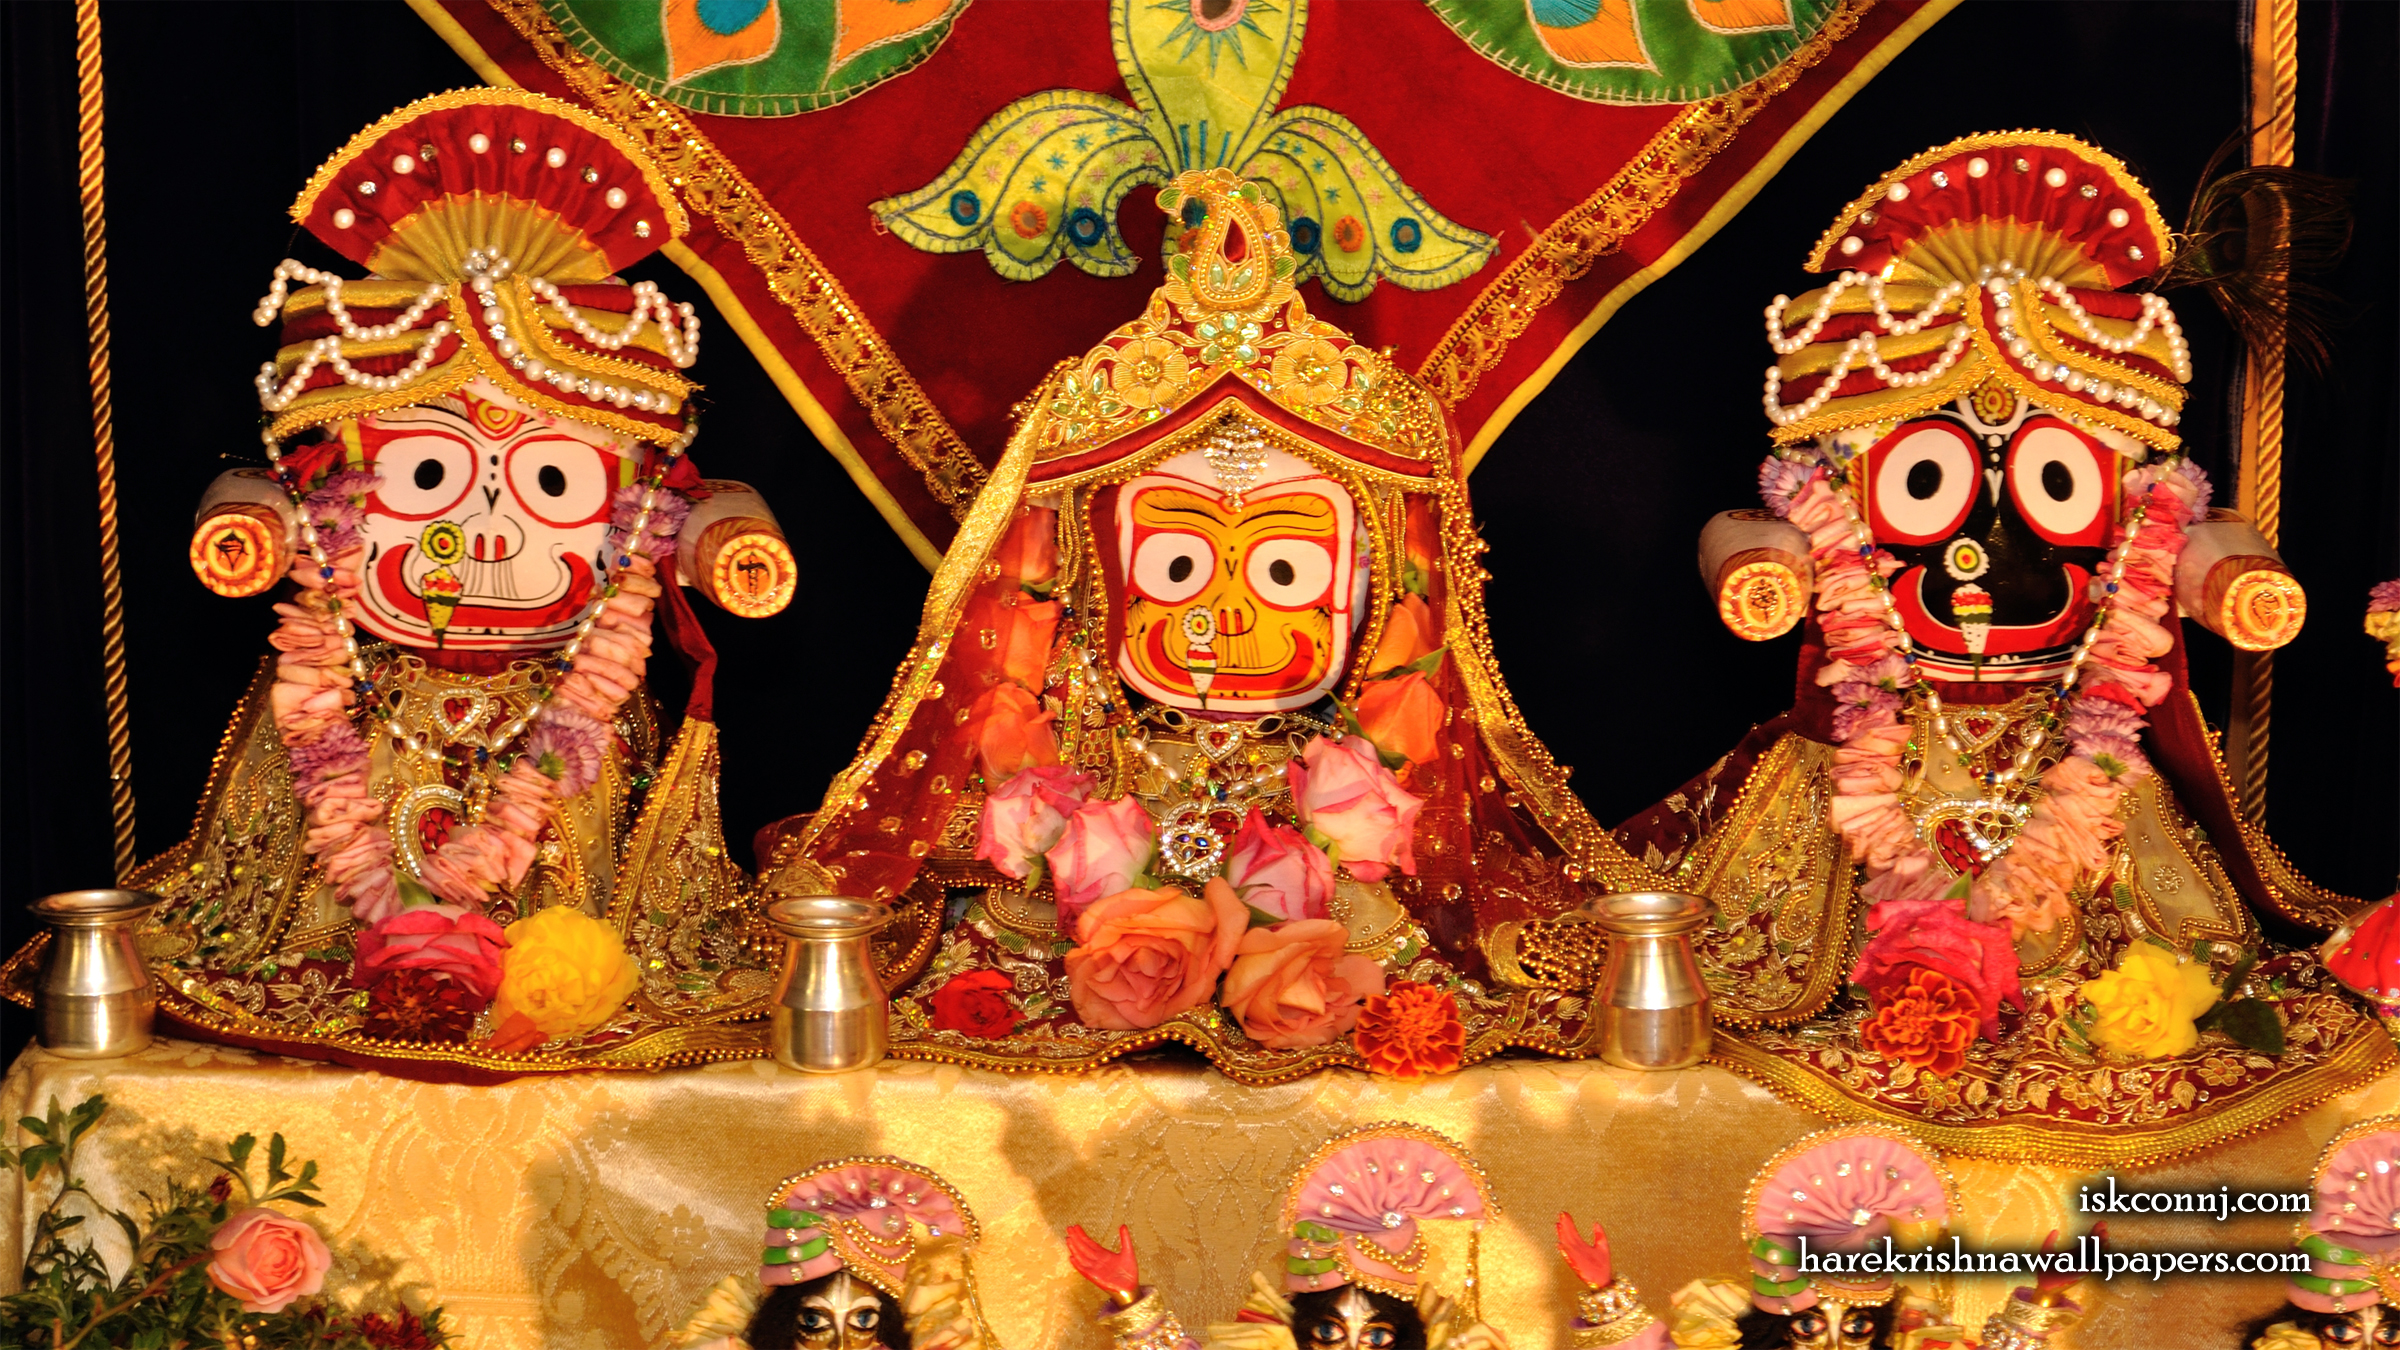 Jagannath Baladeva Subhadra Wallpaper (001) Size 2400x1350 Download